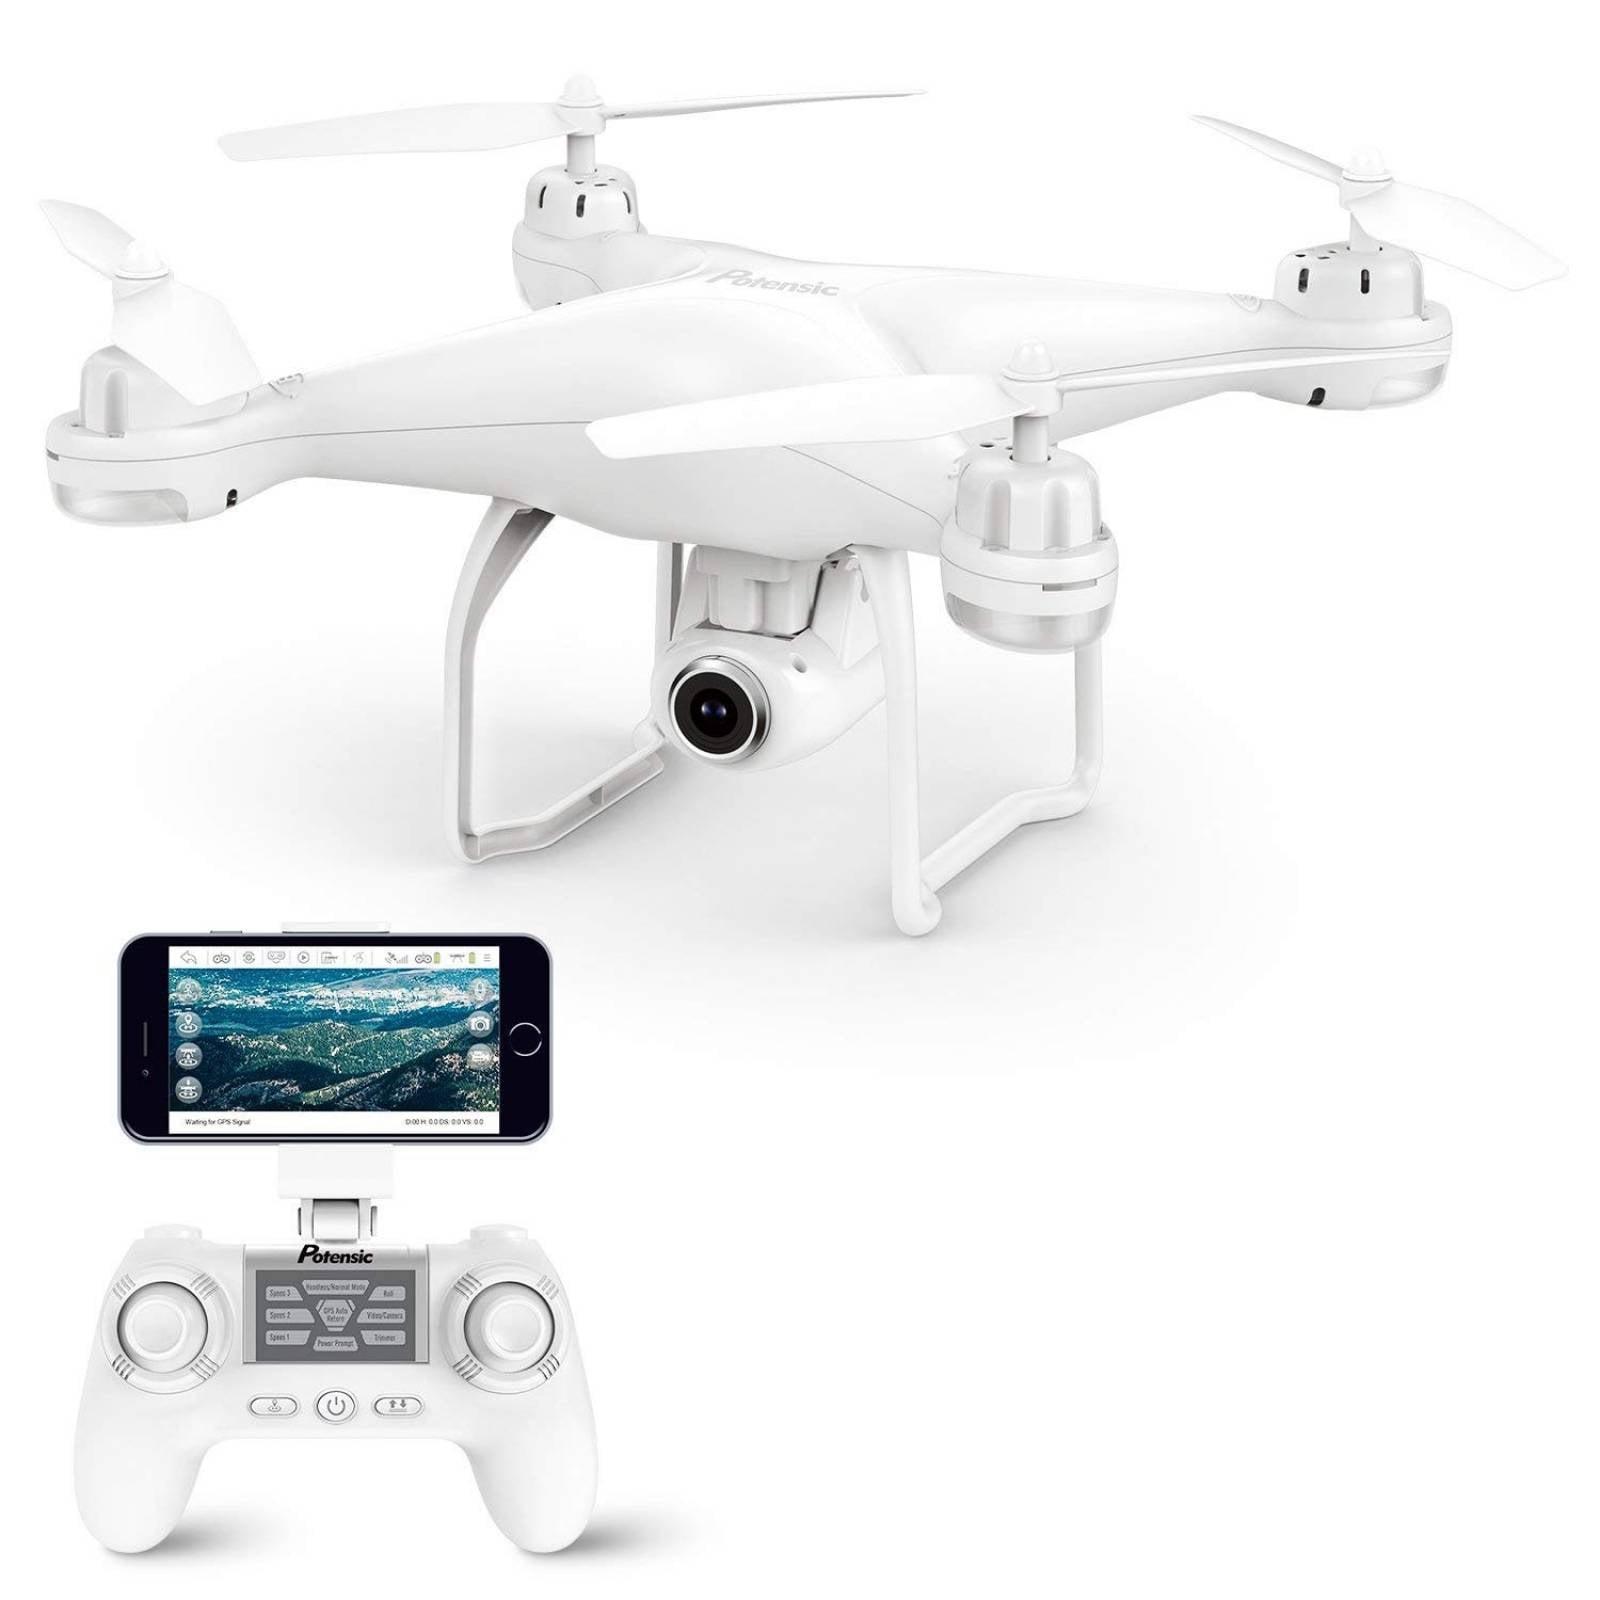 Drone cuadricóptero Potensic T25 GPS cámara 1080P HD WIFI -b